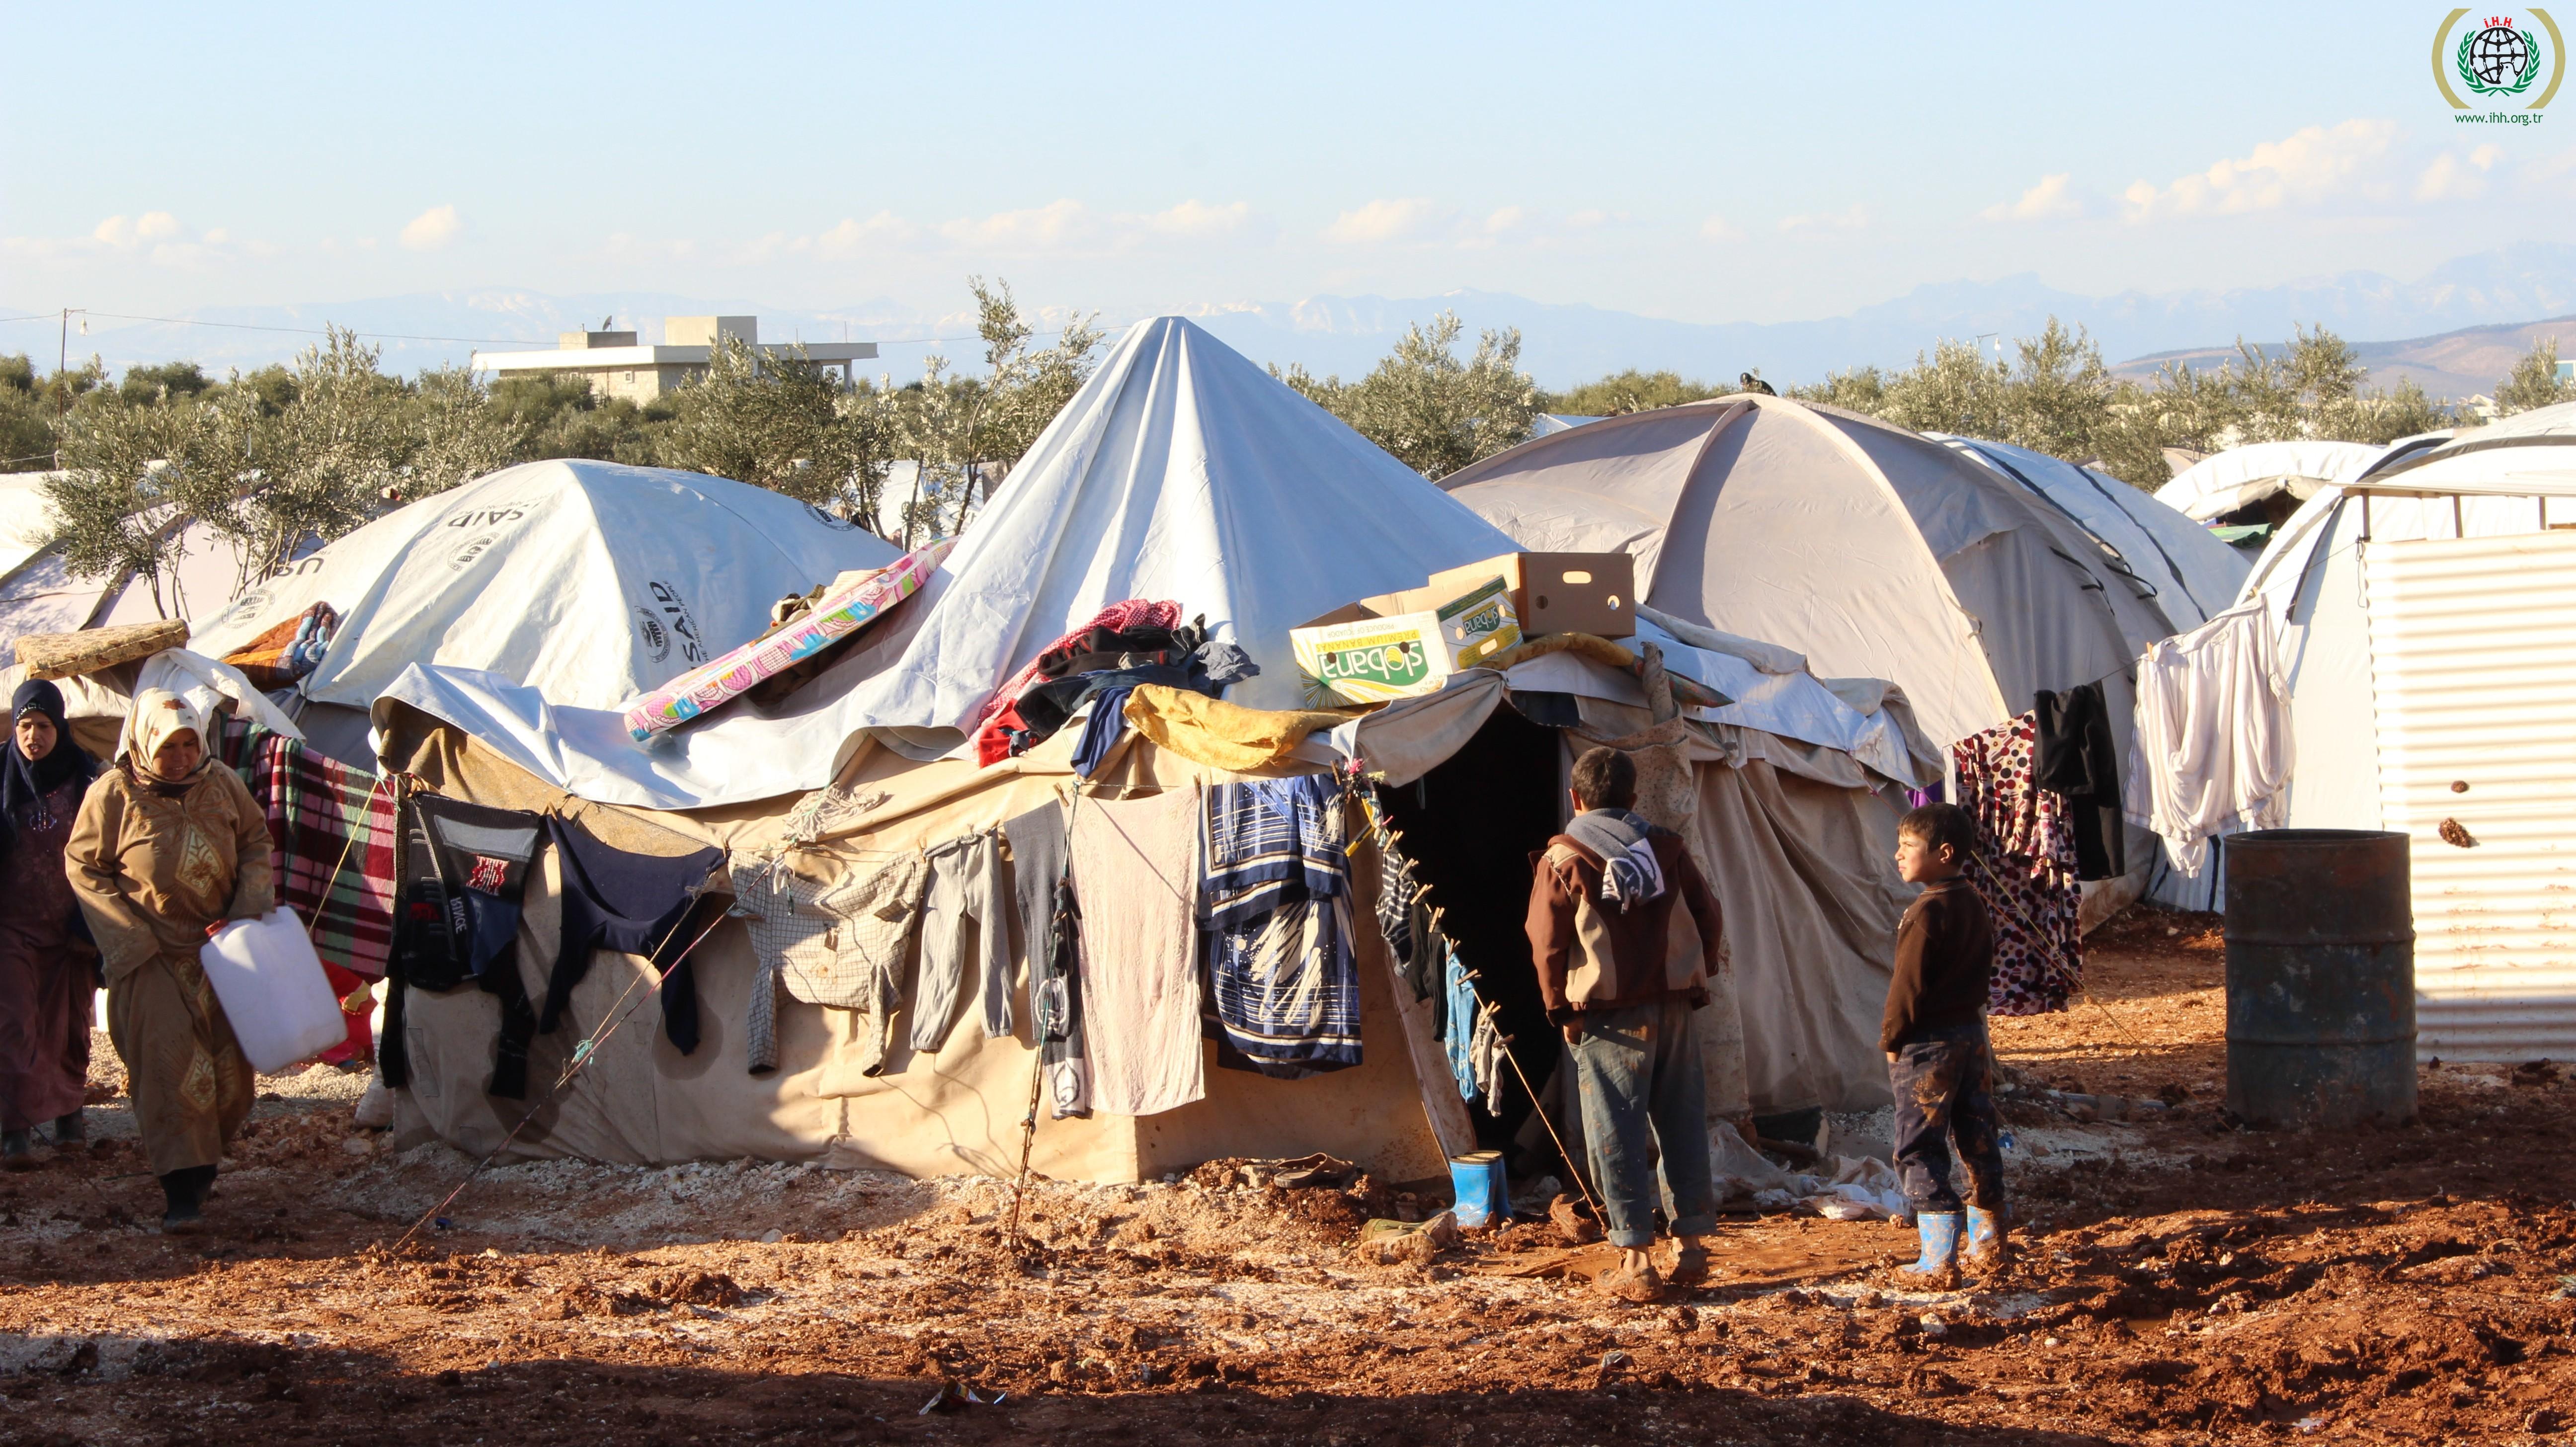 Flüchtlingscamp in Aleppo |  Bild: © IHH Humanitarian Relief Foundation [CC BY-NC-ND 2.0]  - flickr